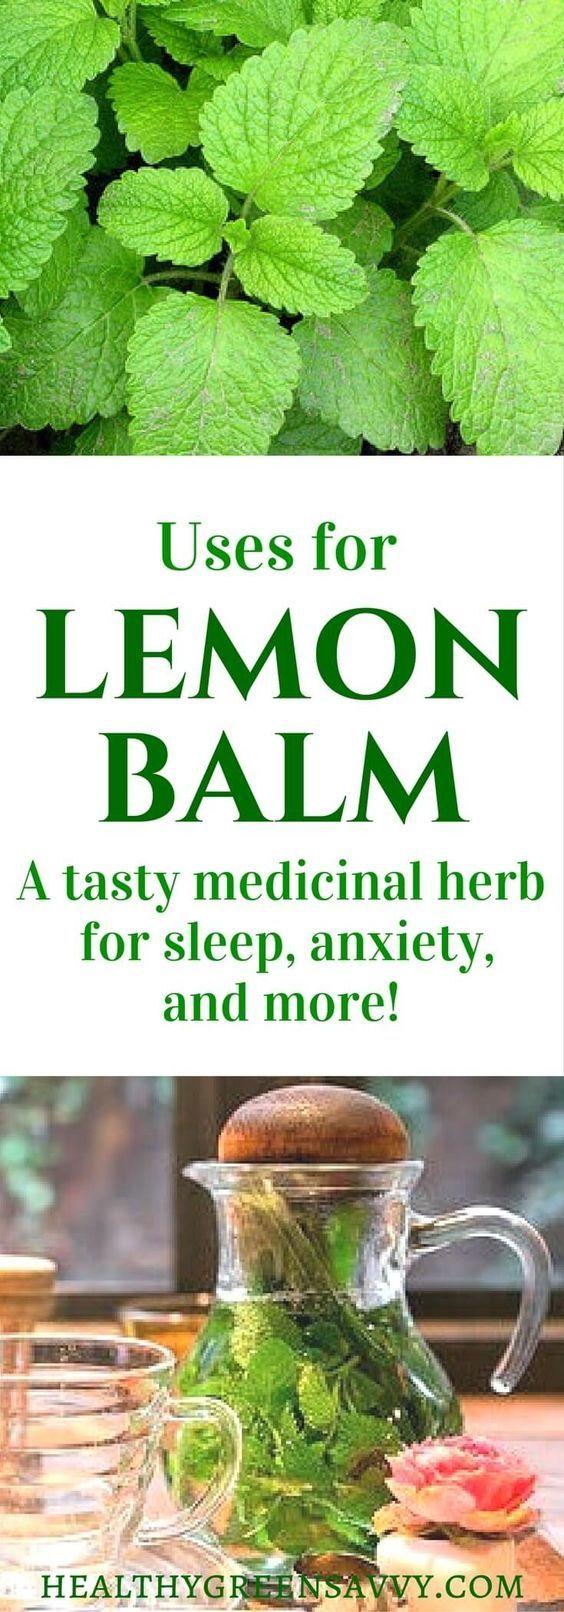 Uses for Lemon Balm, a Delicious Medicinal Herb